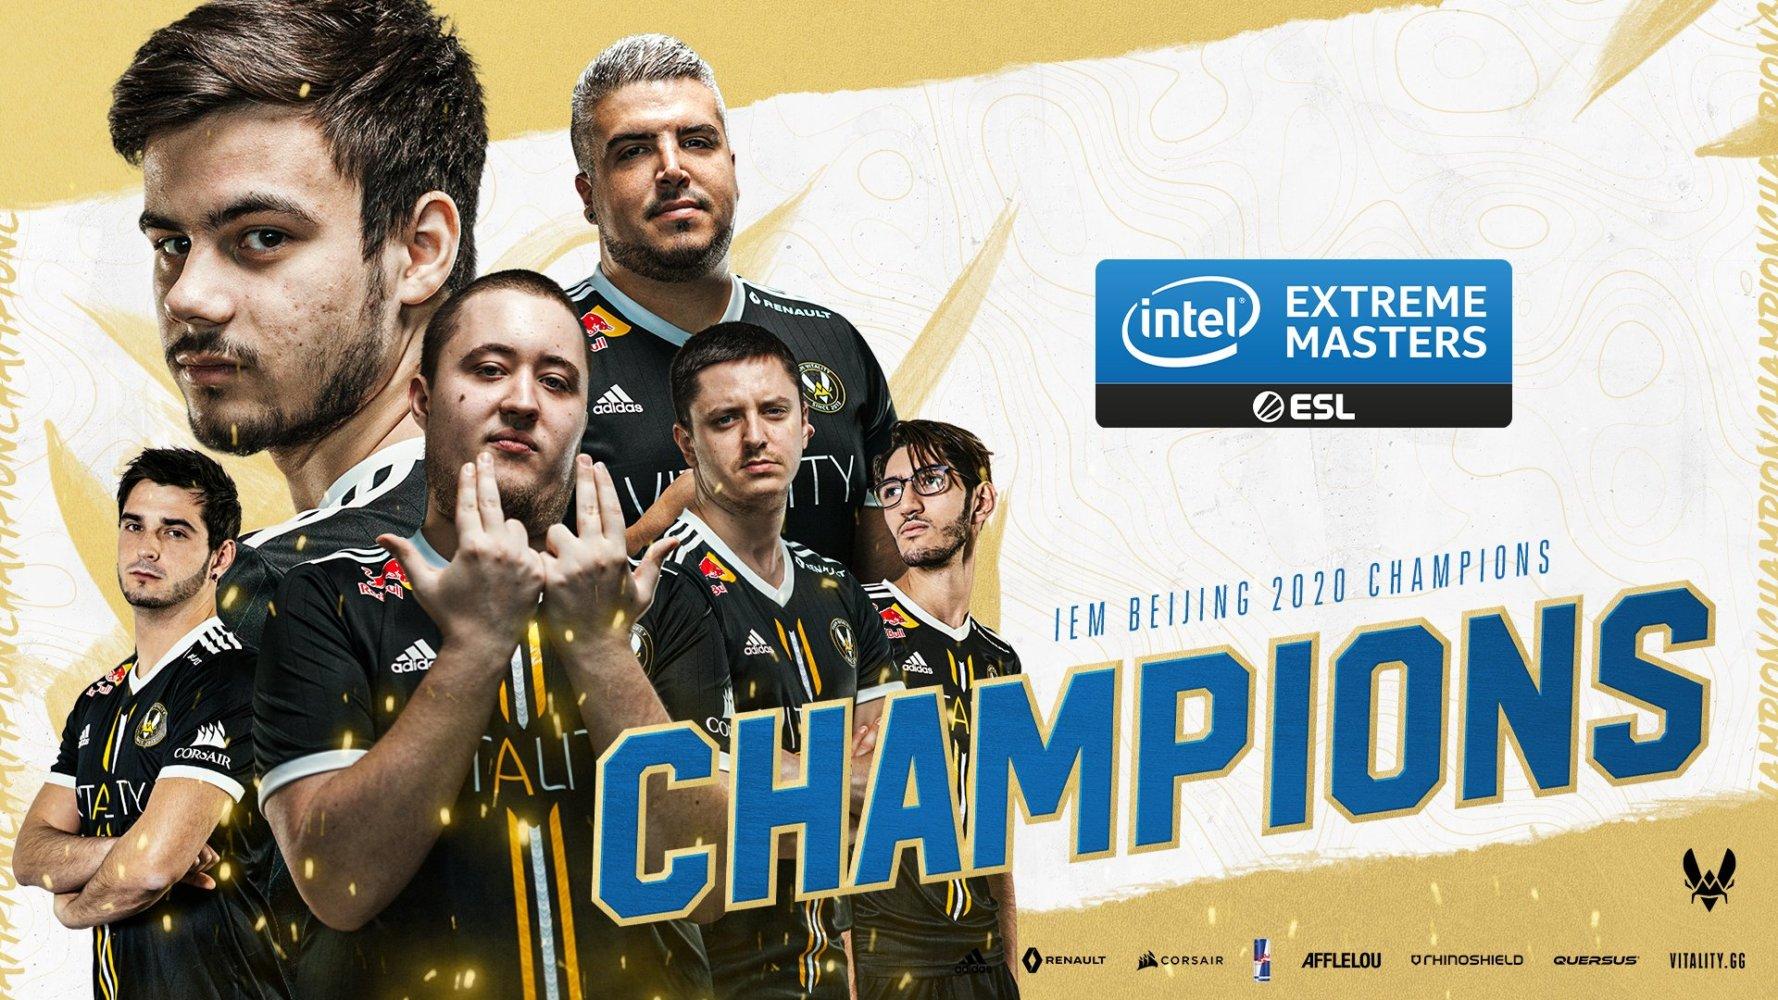 iem beijing team vitality champions